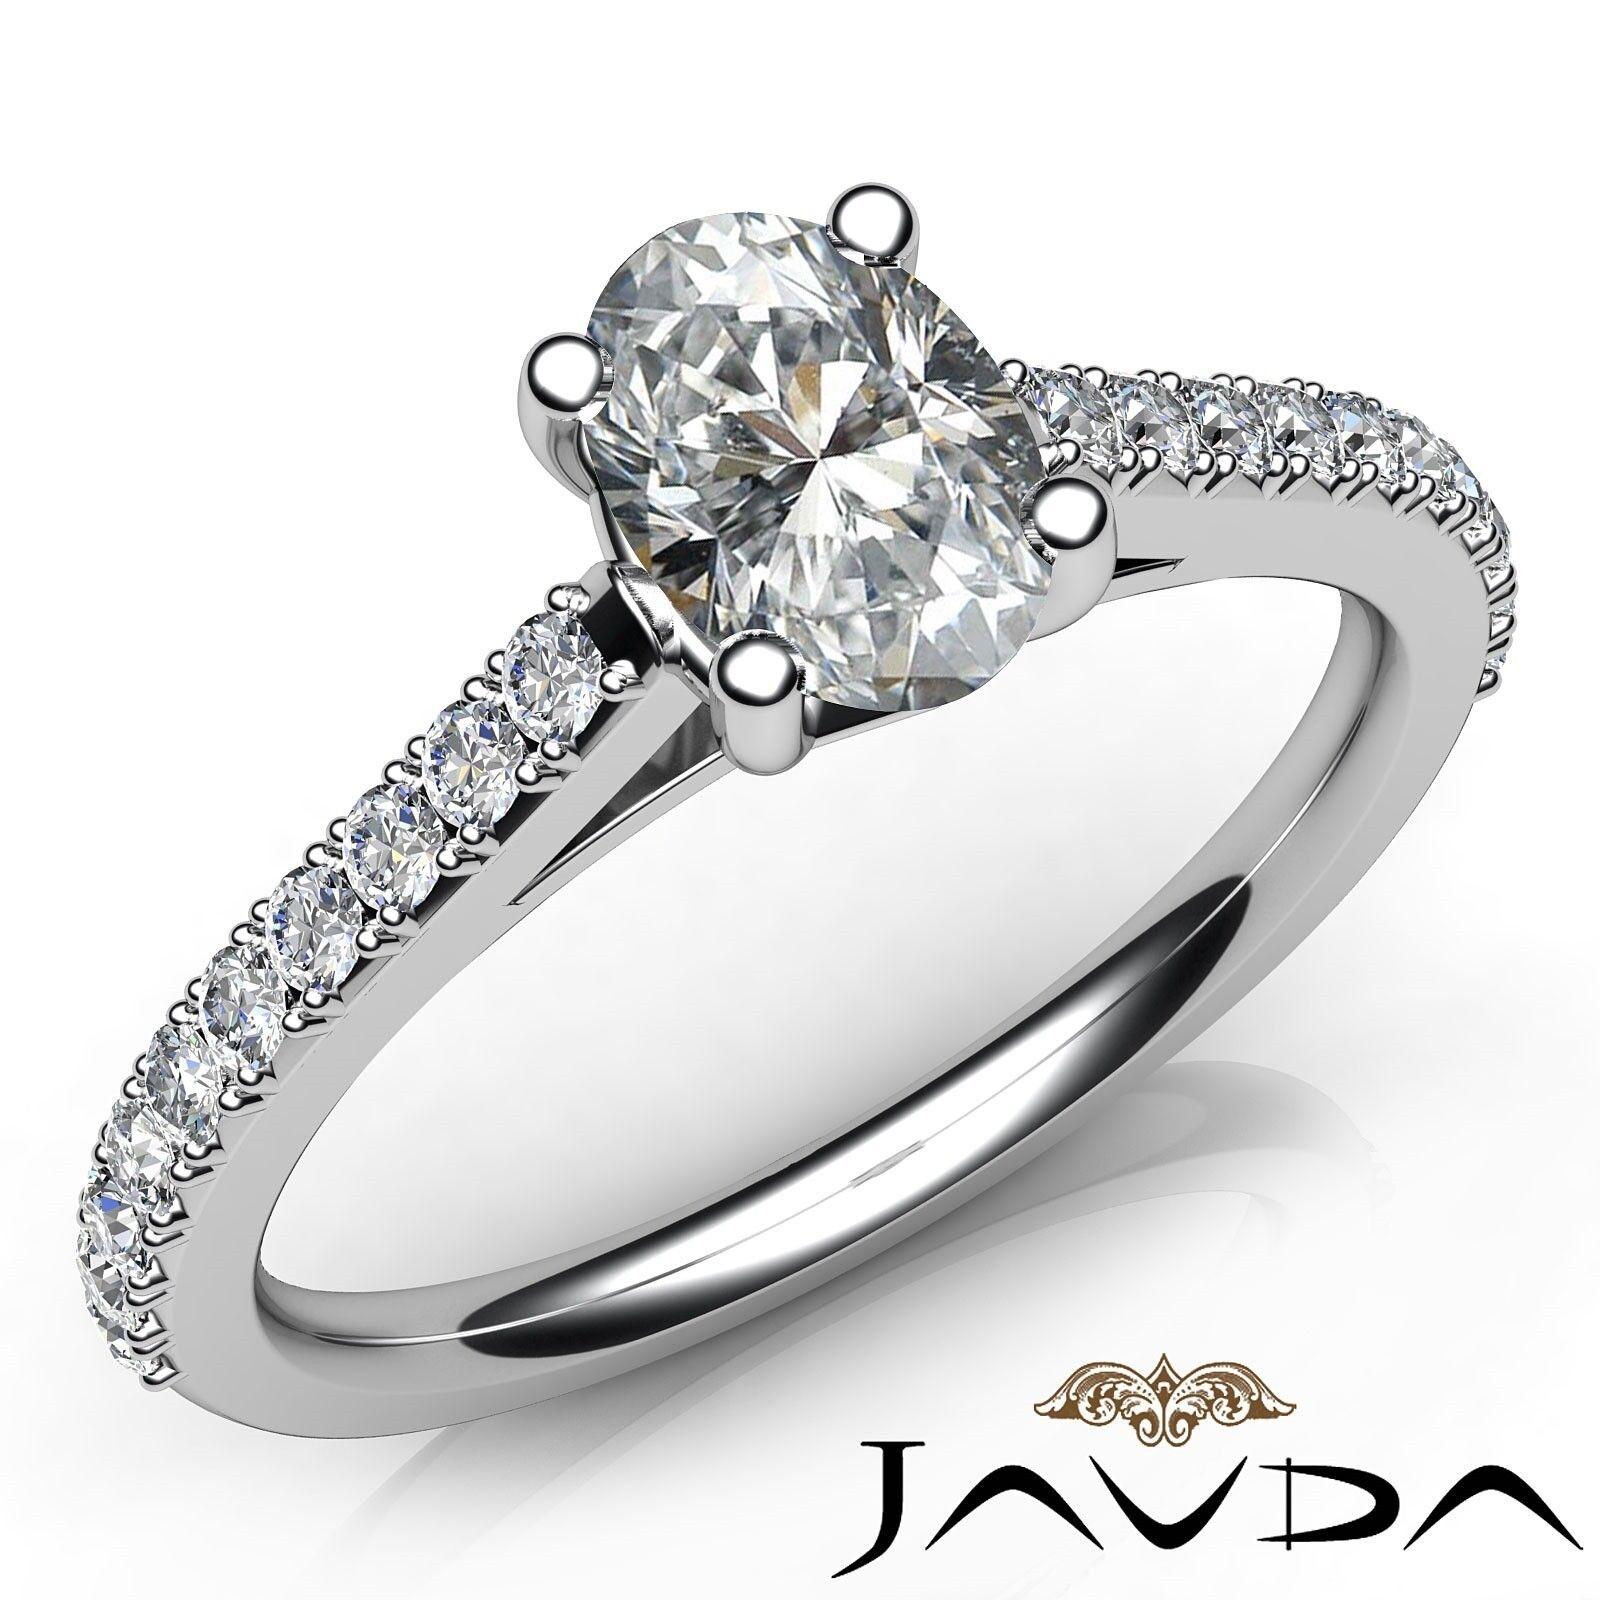 0.8ctw Natural 100% Oval Diamond Engagement Ring GIA F-VVS2 White Gold Women New